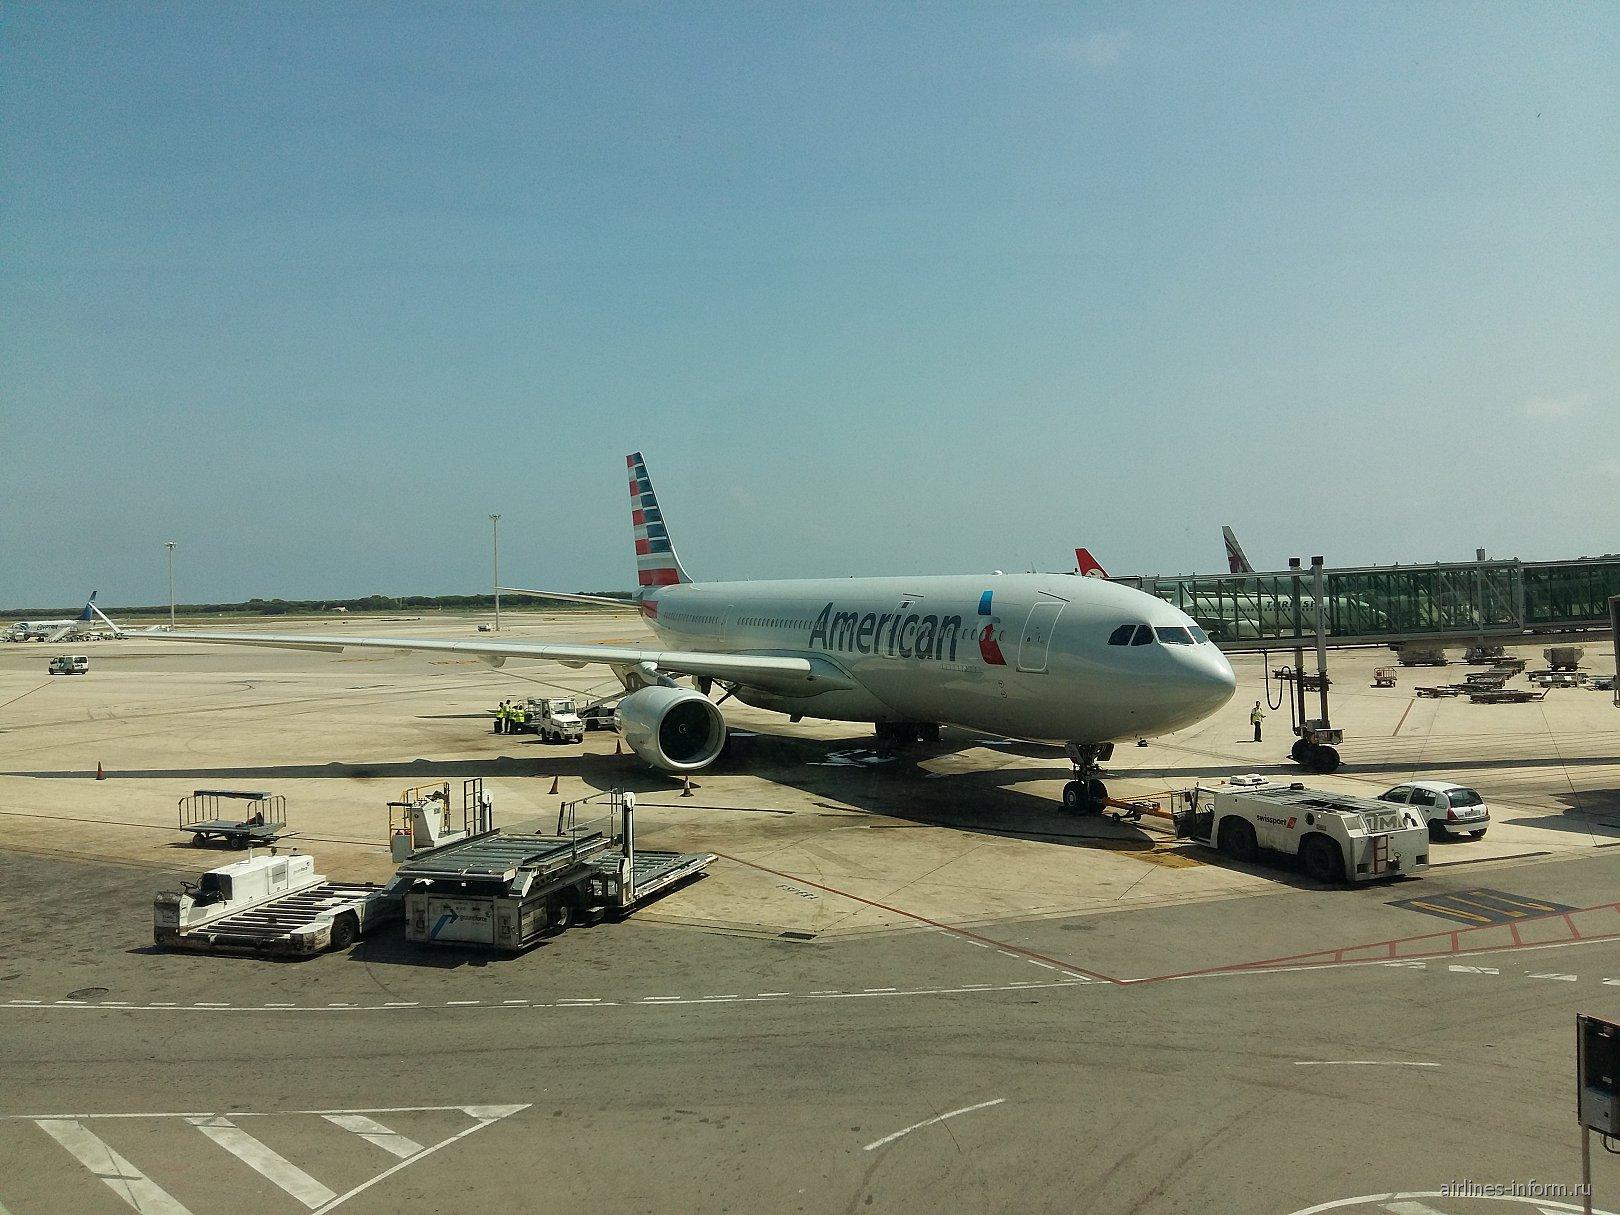 Airbus A330-300 Американских авиалиний в аэропорту Барселоны